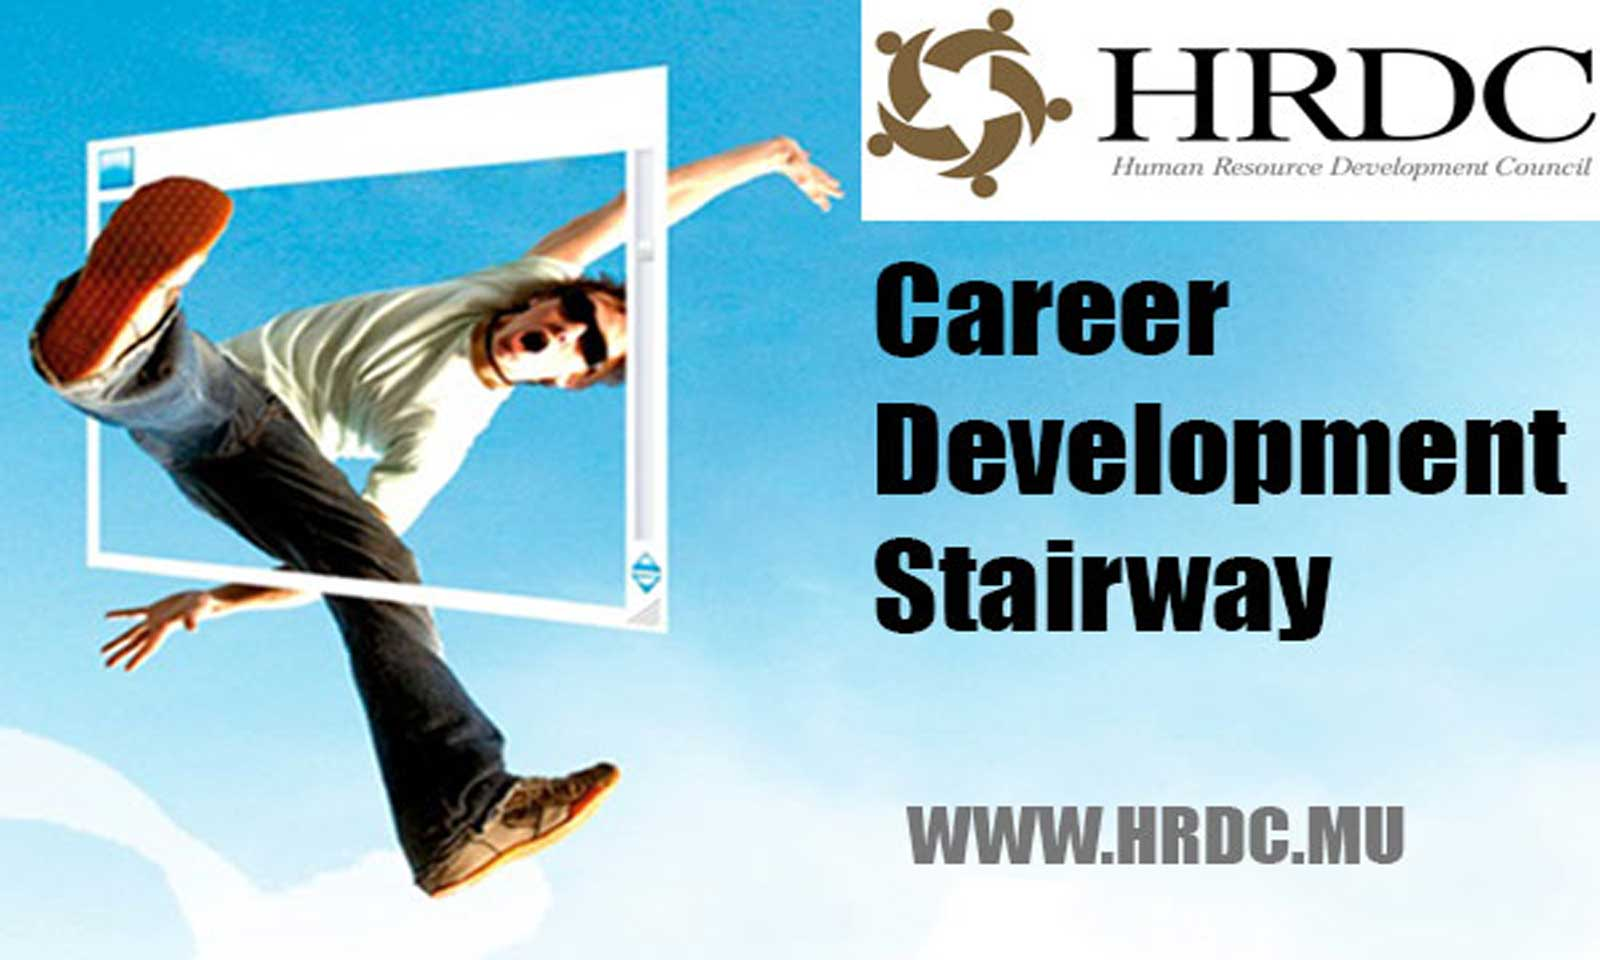 Career Development Stairway